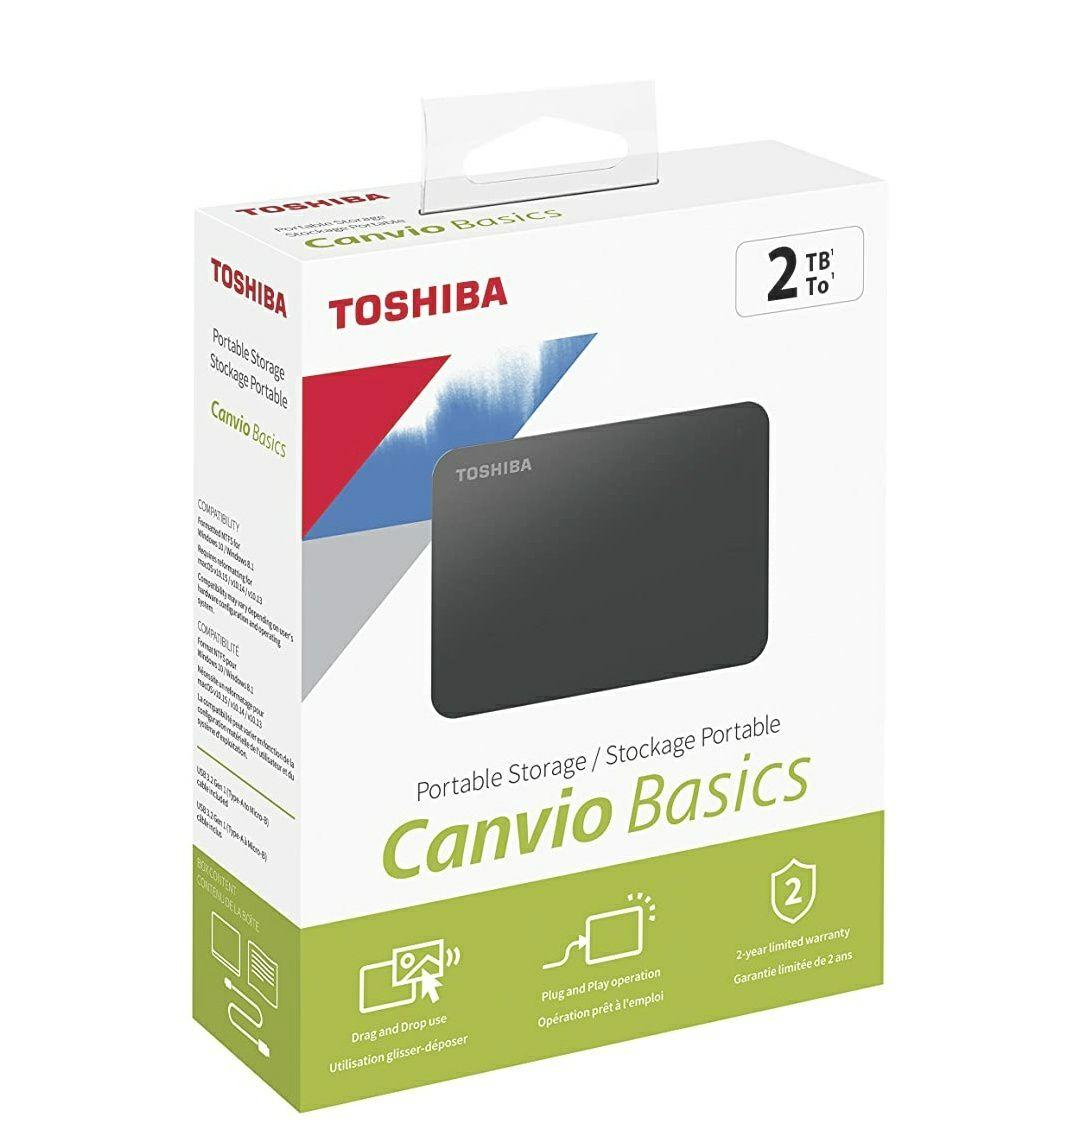 Toshiba Canvio Basics 2TB